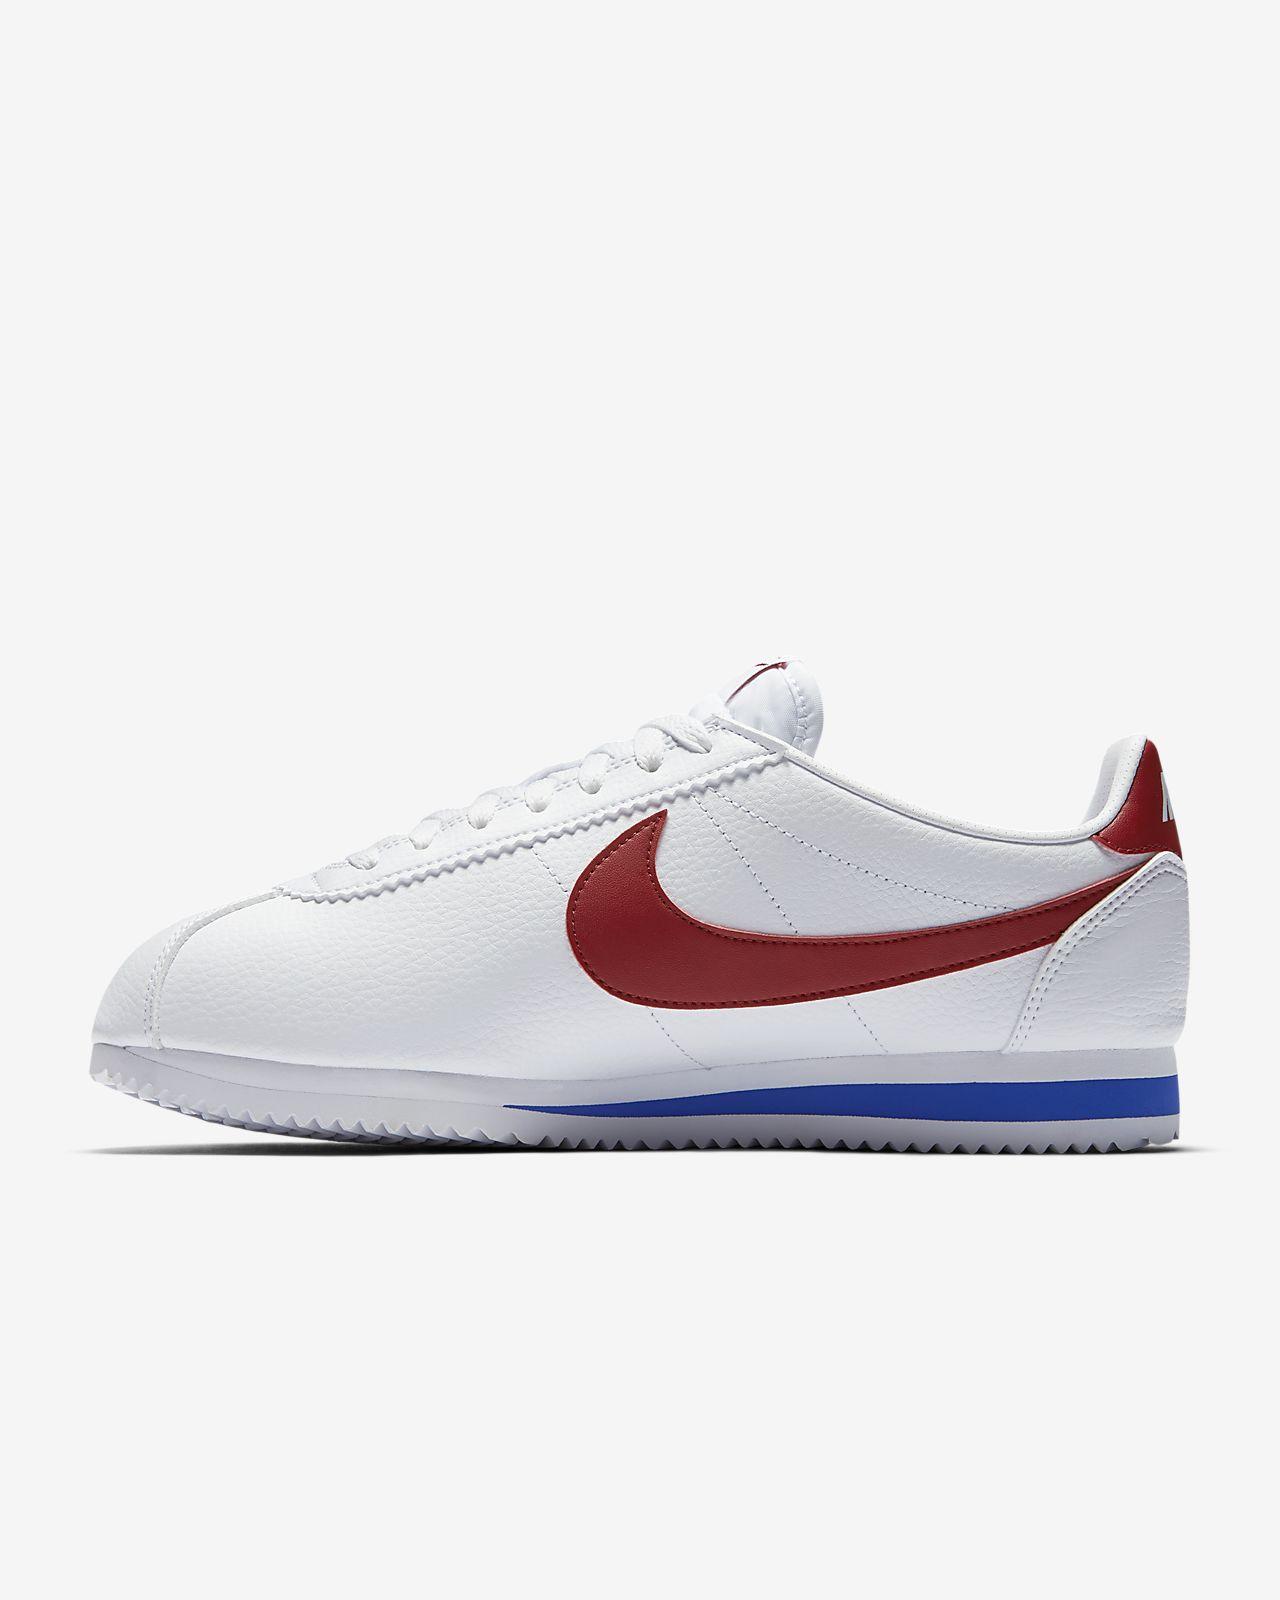 bb0e75b0 Low Resolution Мужские кроссовки Nike Classic Cortez Мужские кроссовки Nike  Classic Cortez